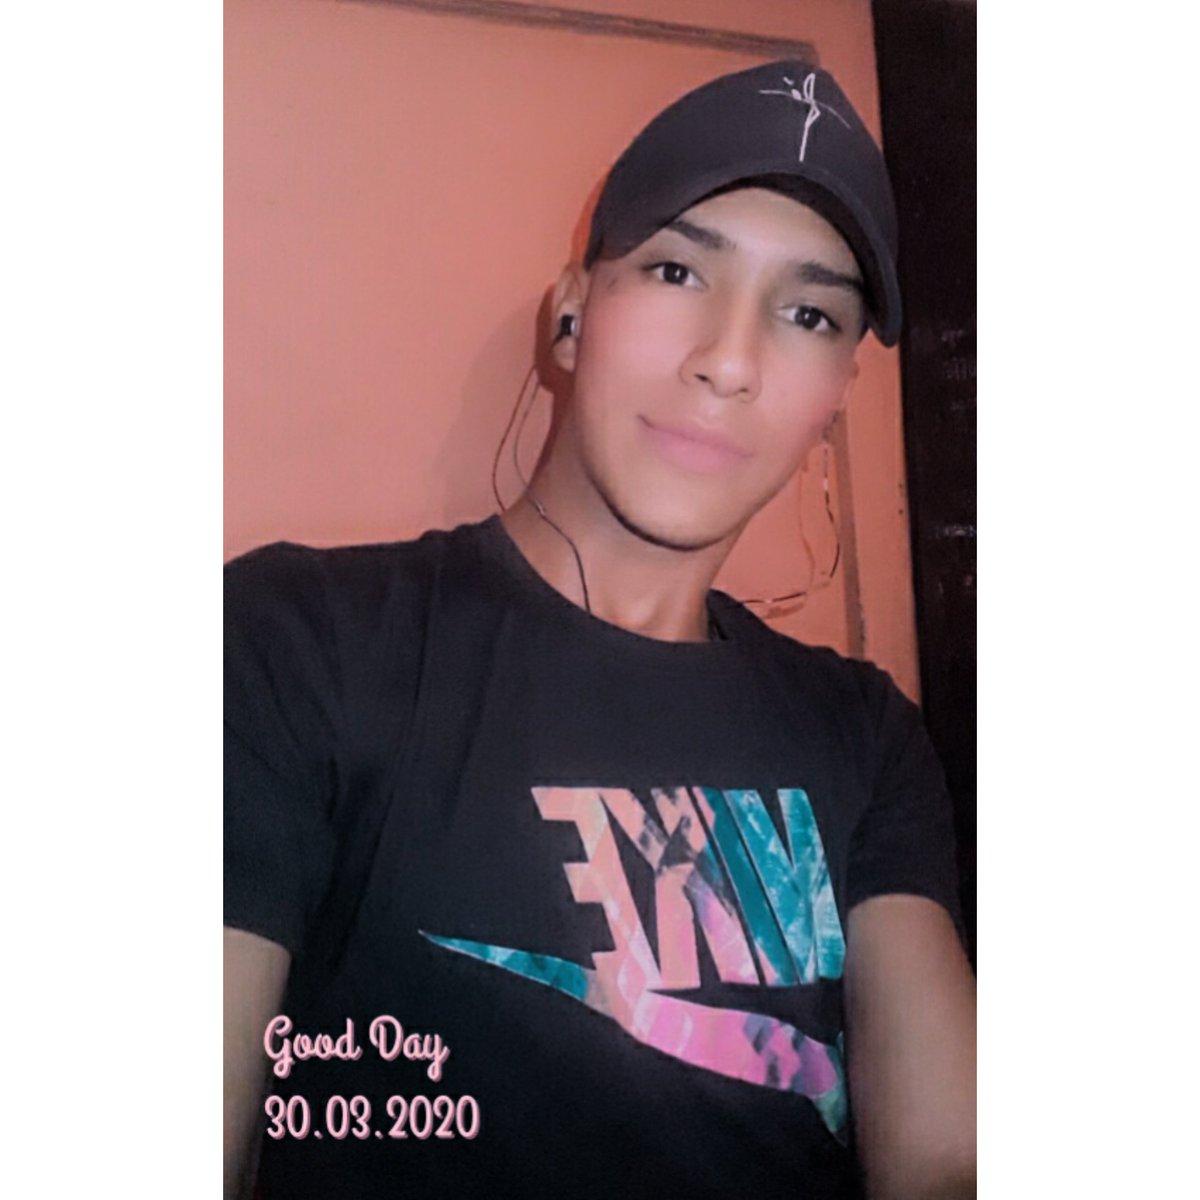 #cute #Lovely #Kardashian #TopDeLaSemana #Venezuela #brothersisterlove #GayIndonesia #pride